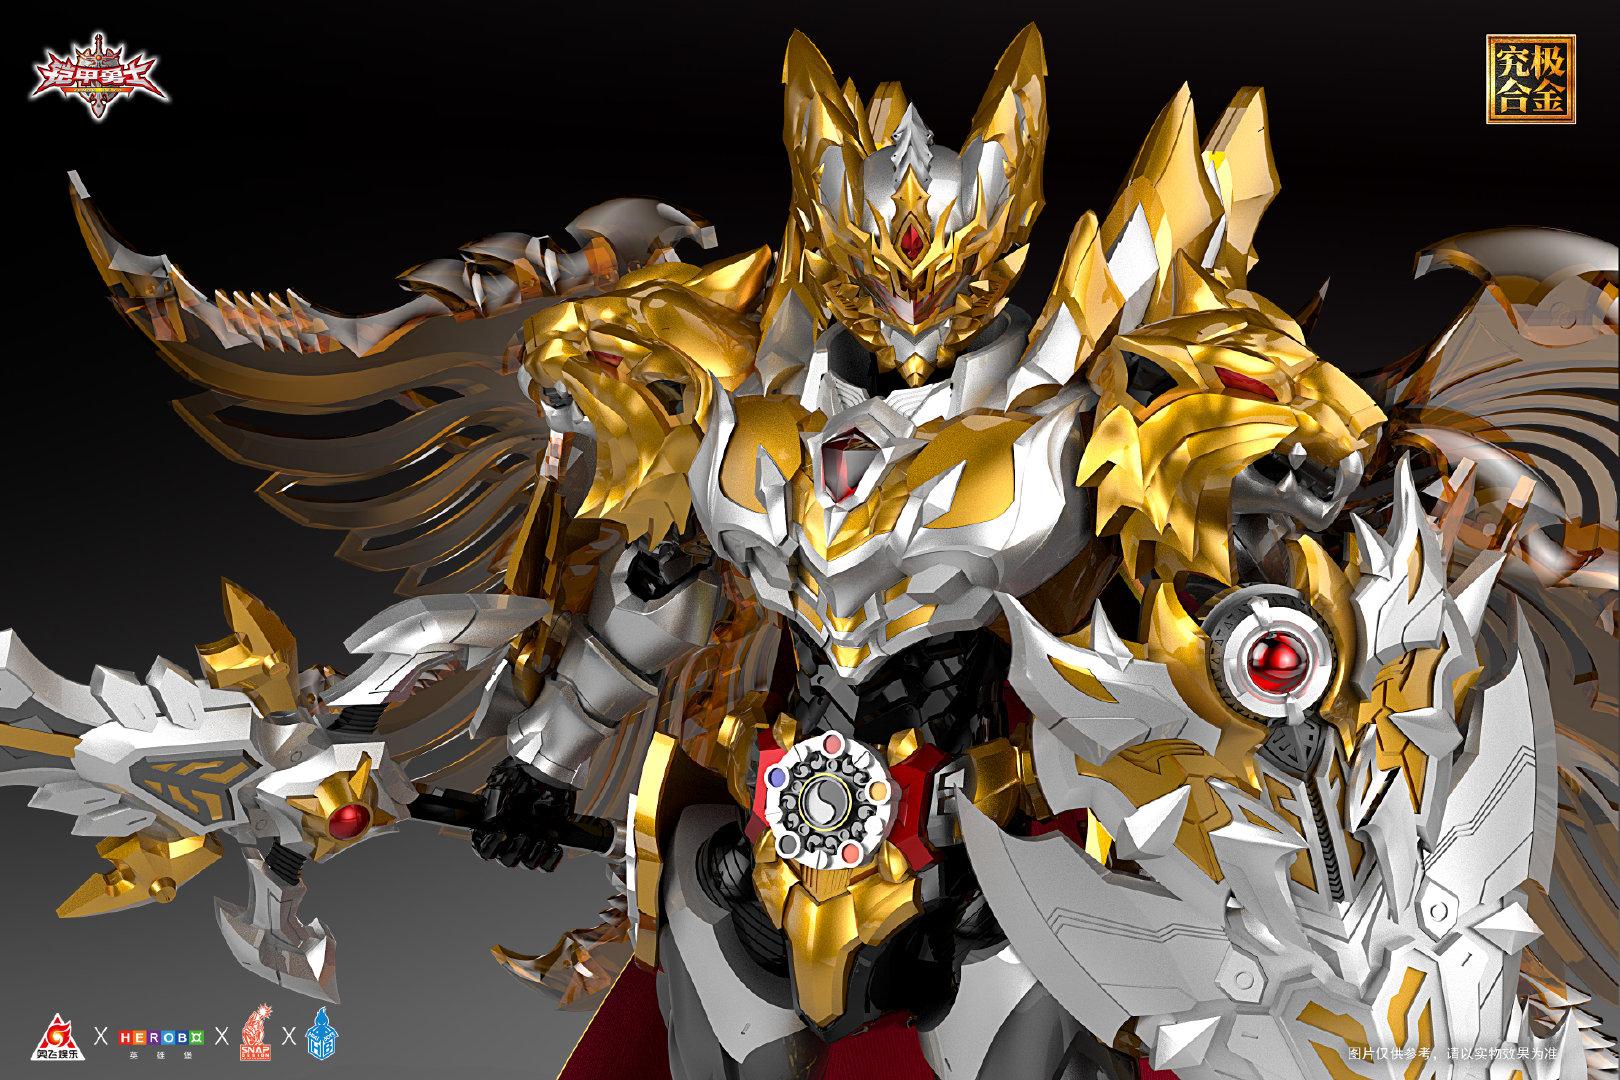 S535_Armor_hero_Emperor_038.jpg